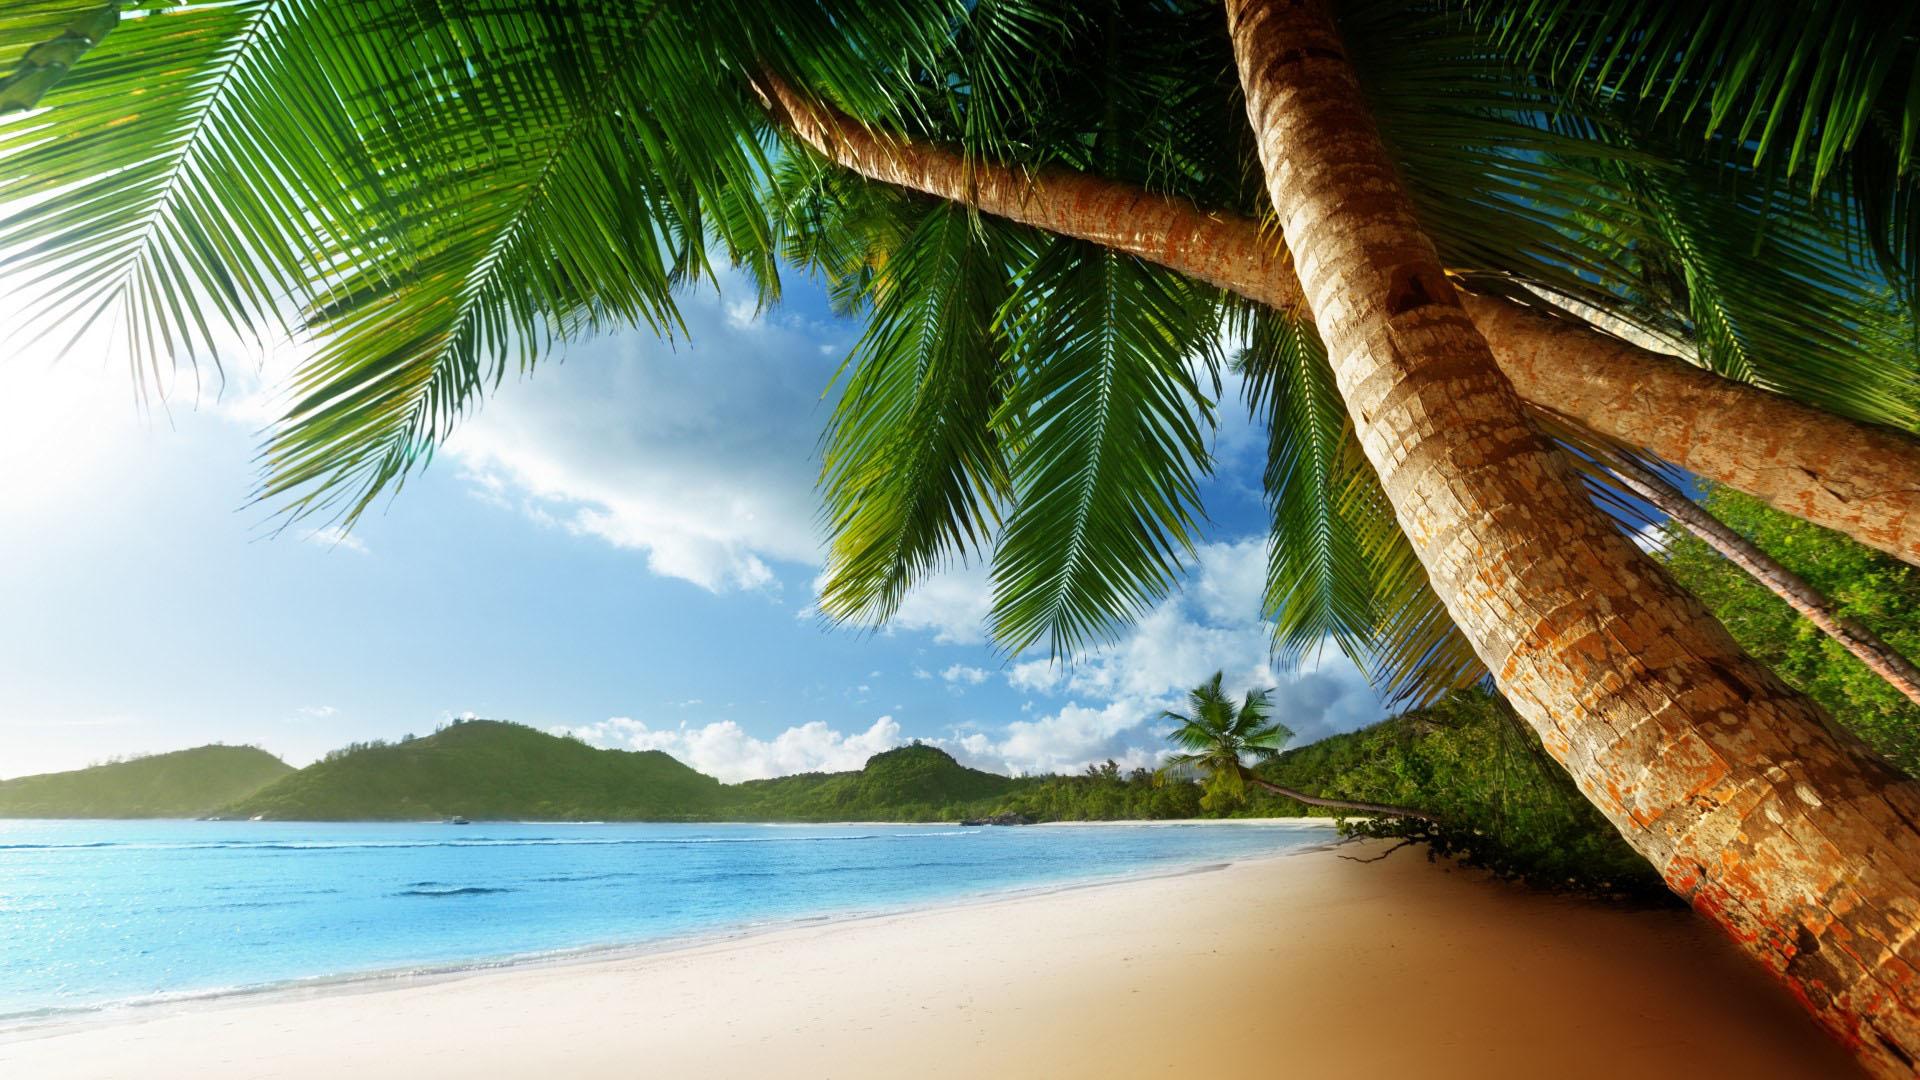 paradise island wallpaper 2920jpg 1920x1080